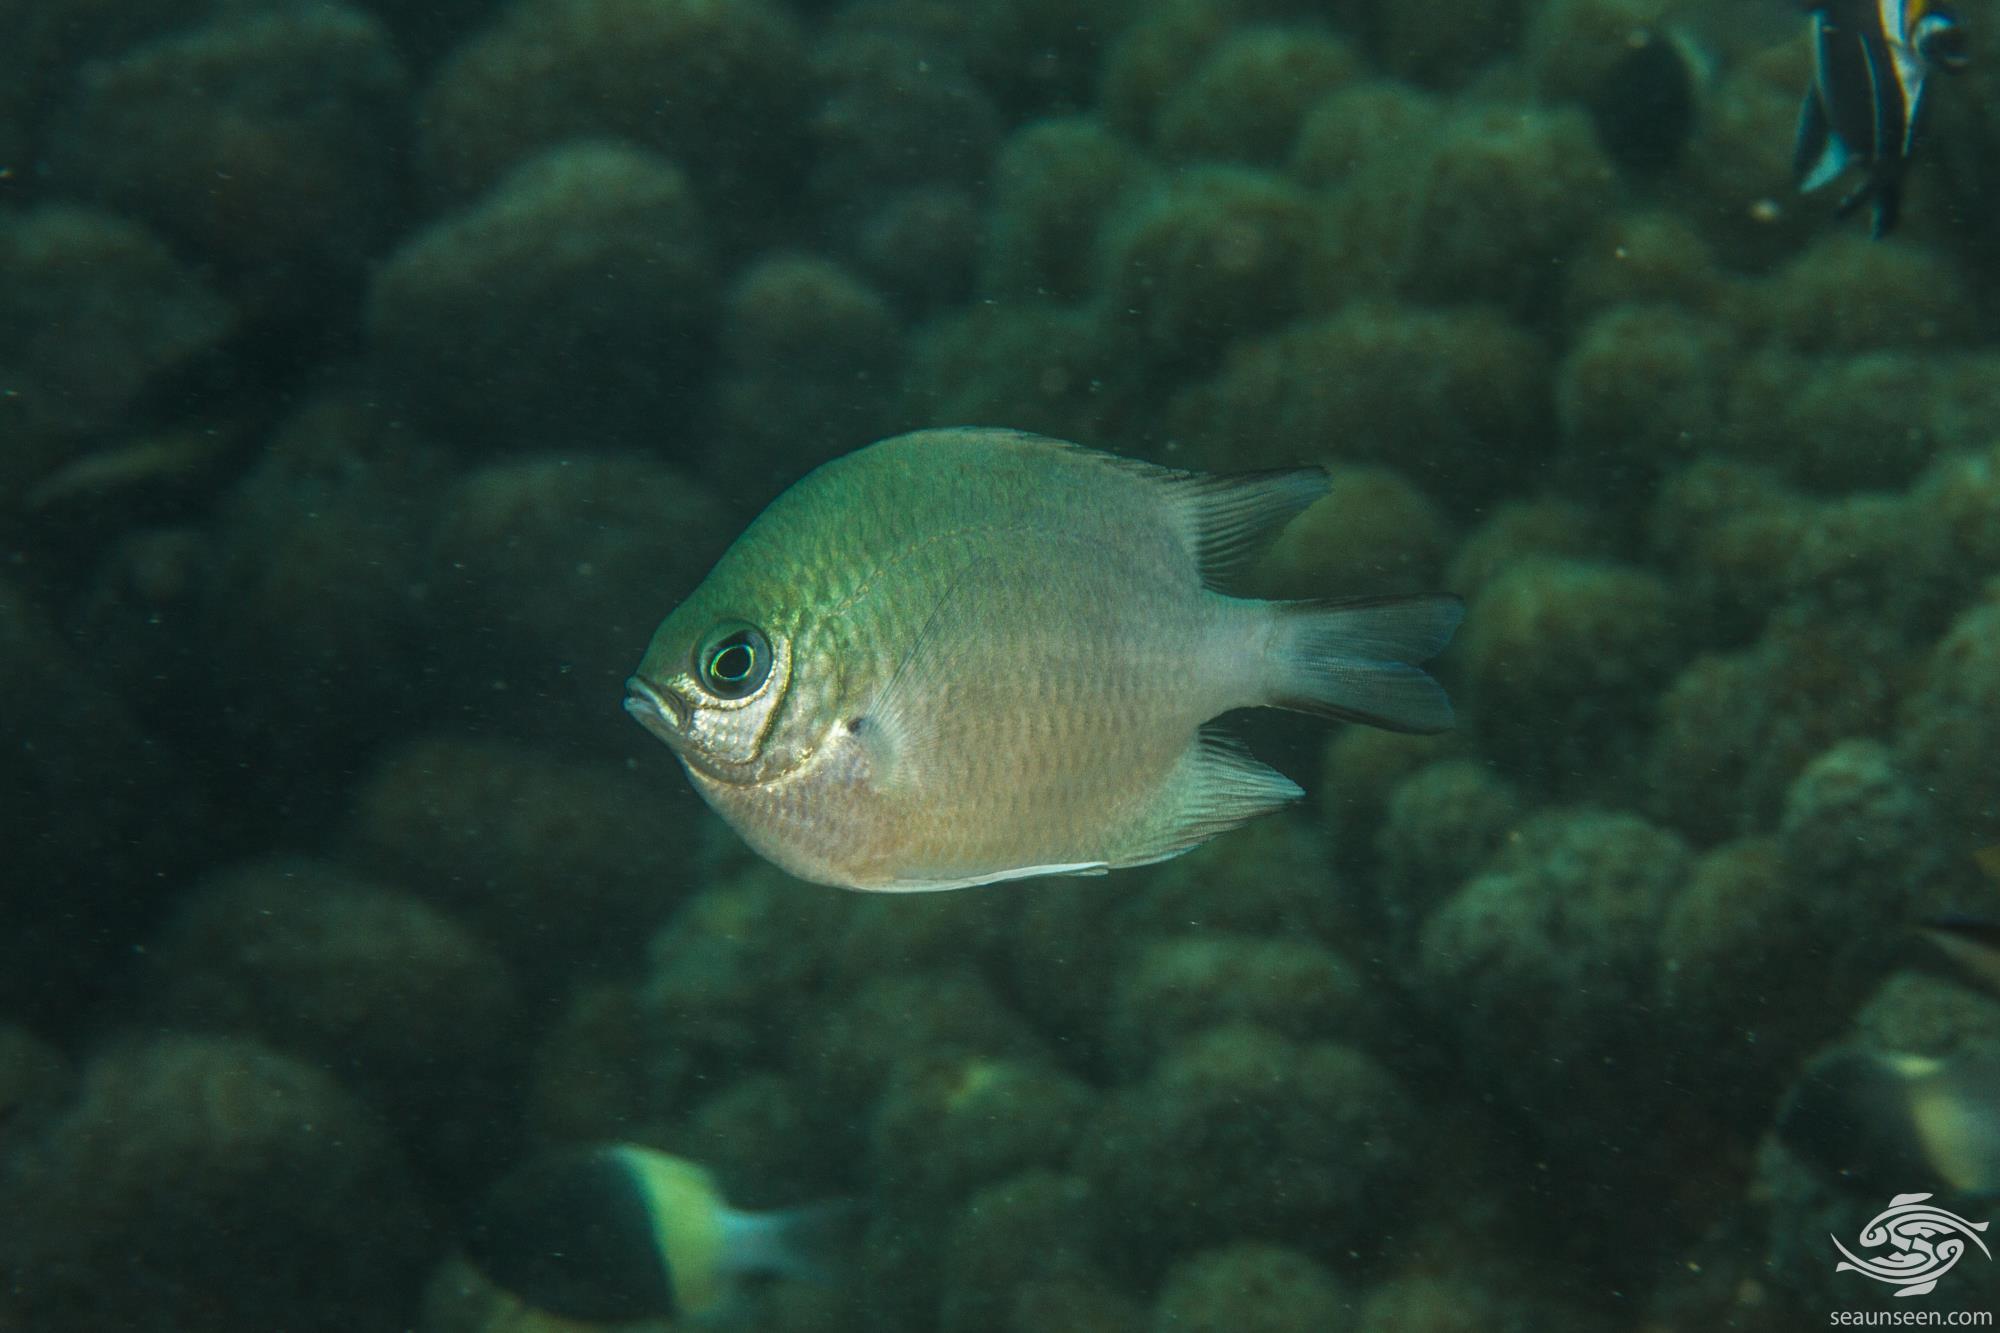 Maldives damselfish (Amblyglyphidodon indicus)